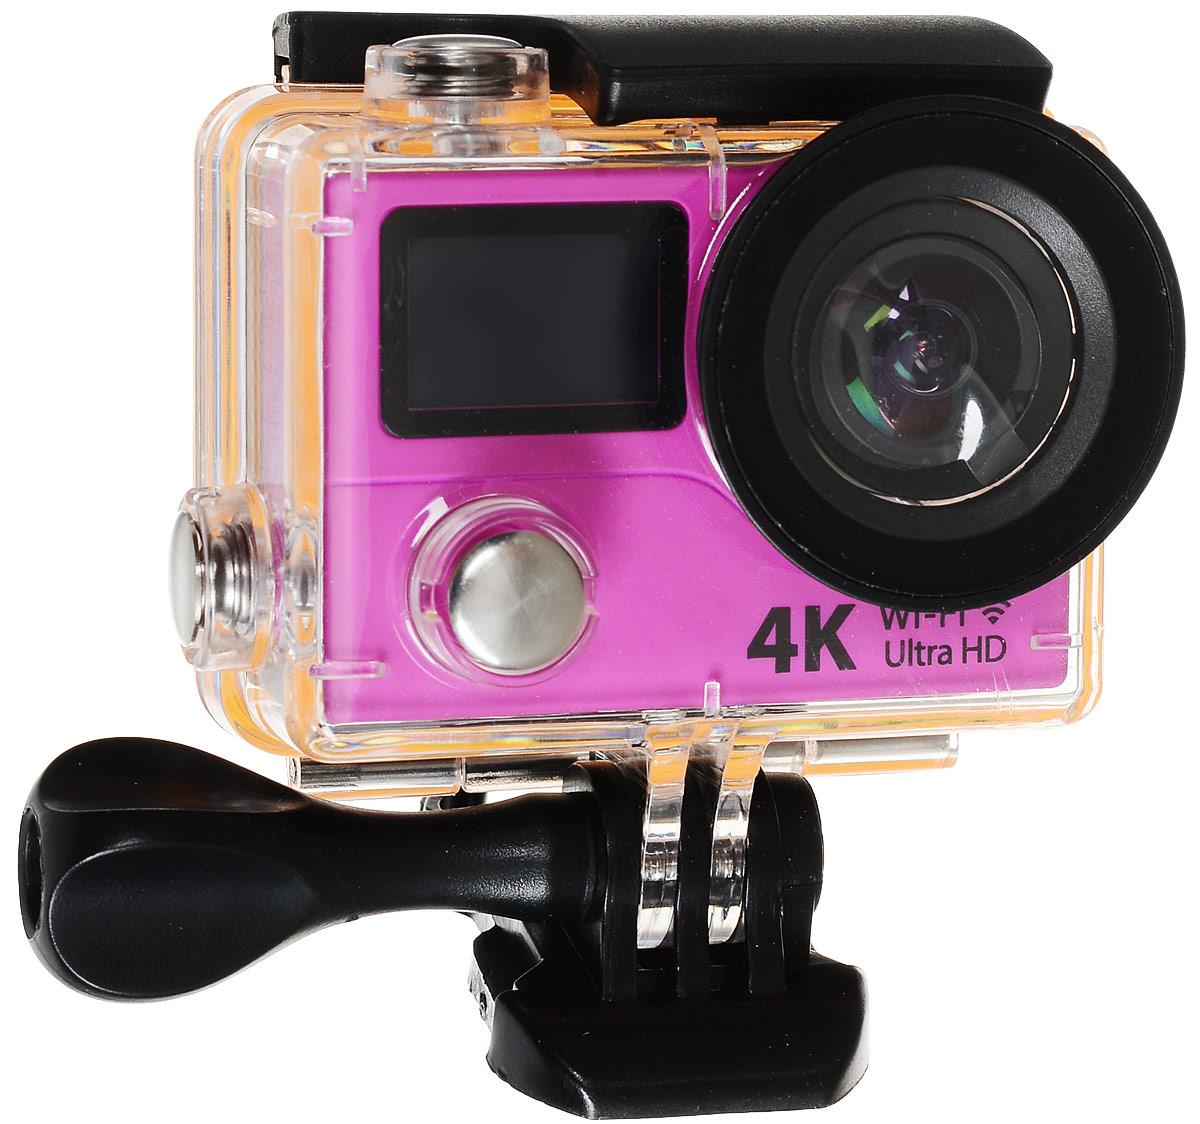 экшн-камера eken eken h3r ultra hd экшн-камера